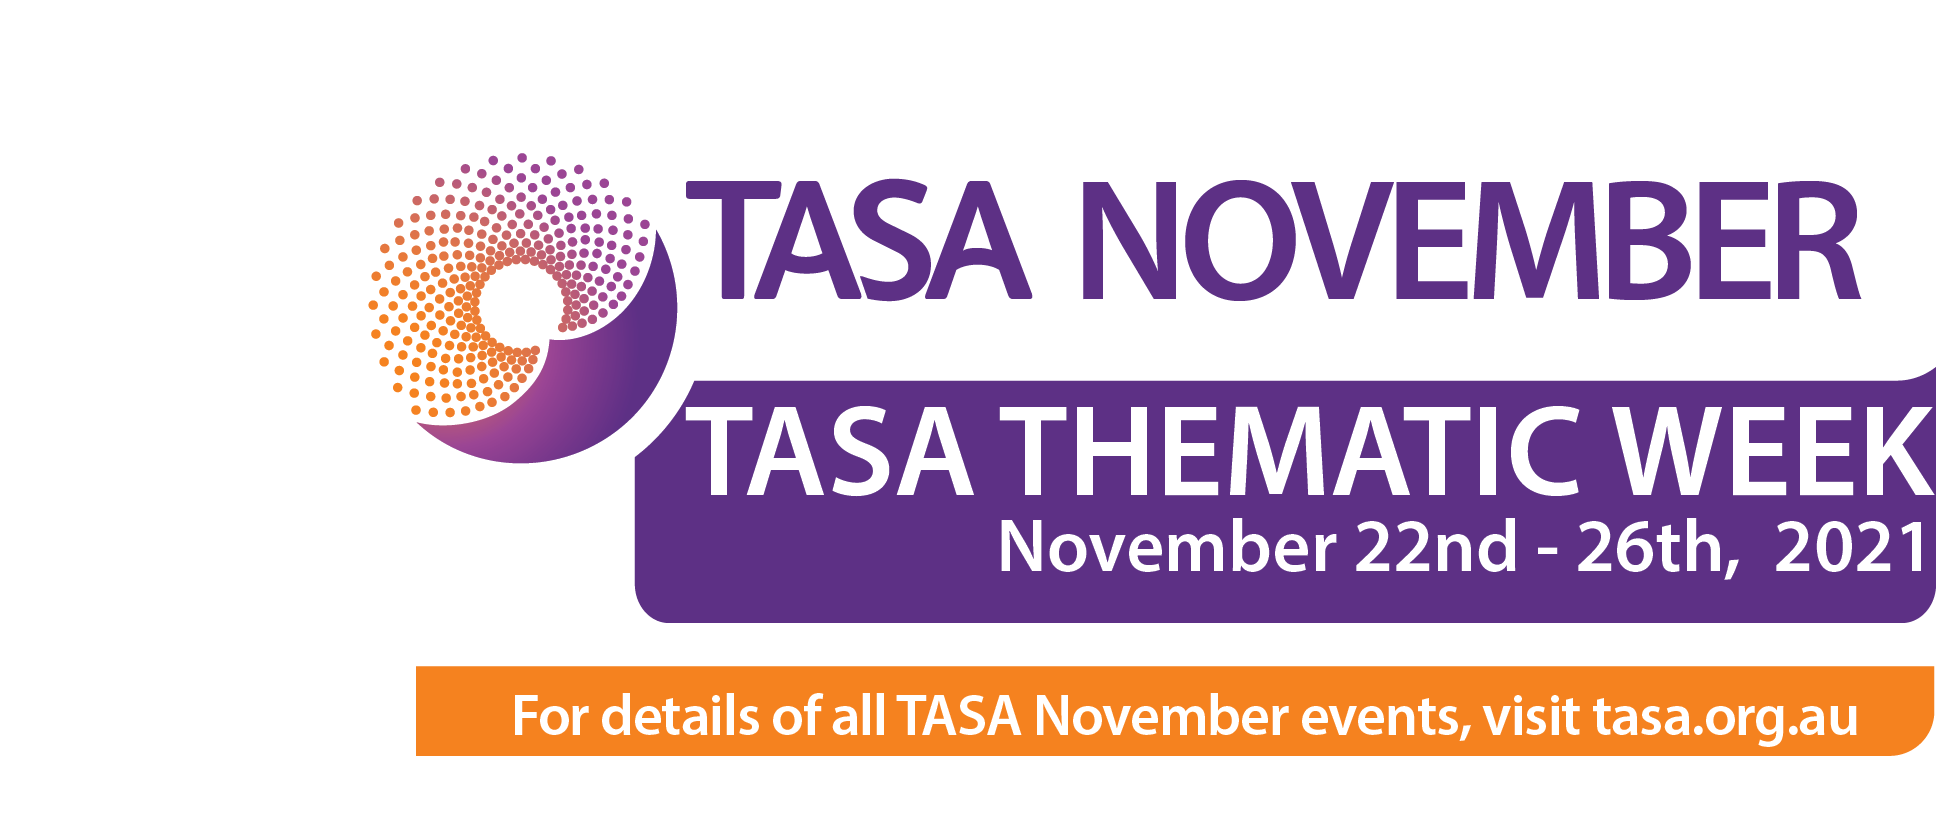 TASA Thematic Week